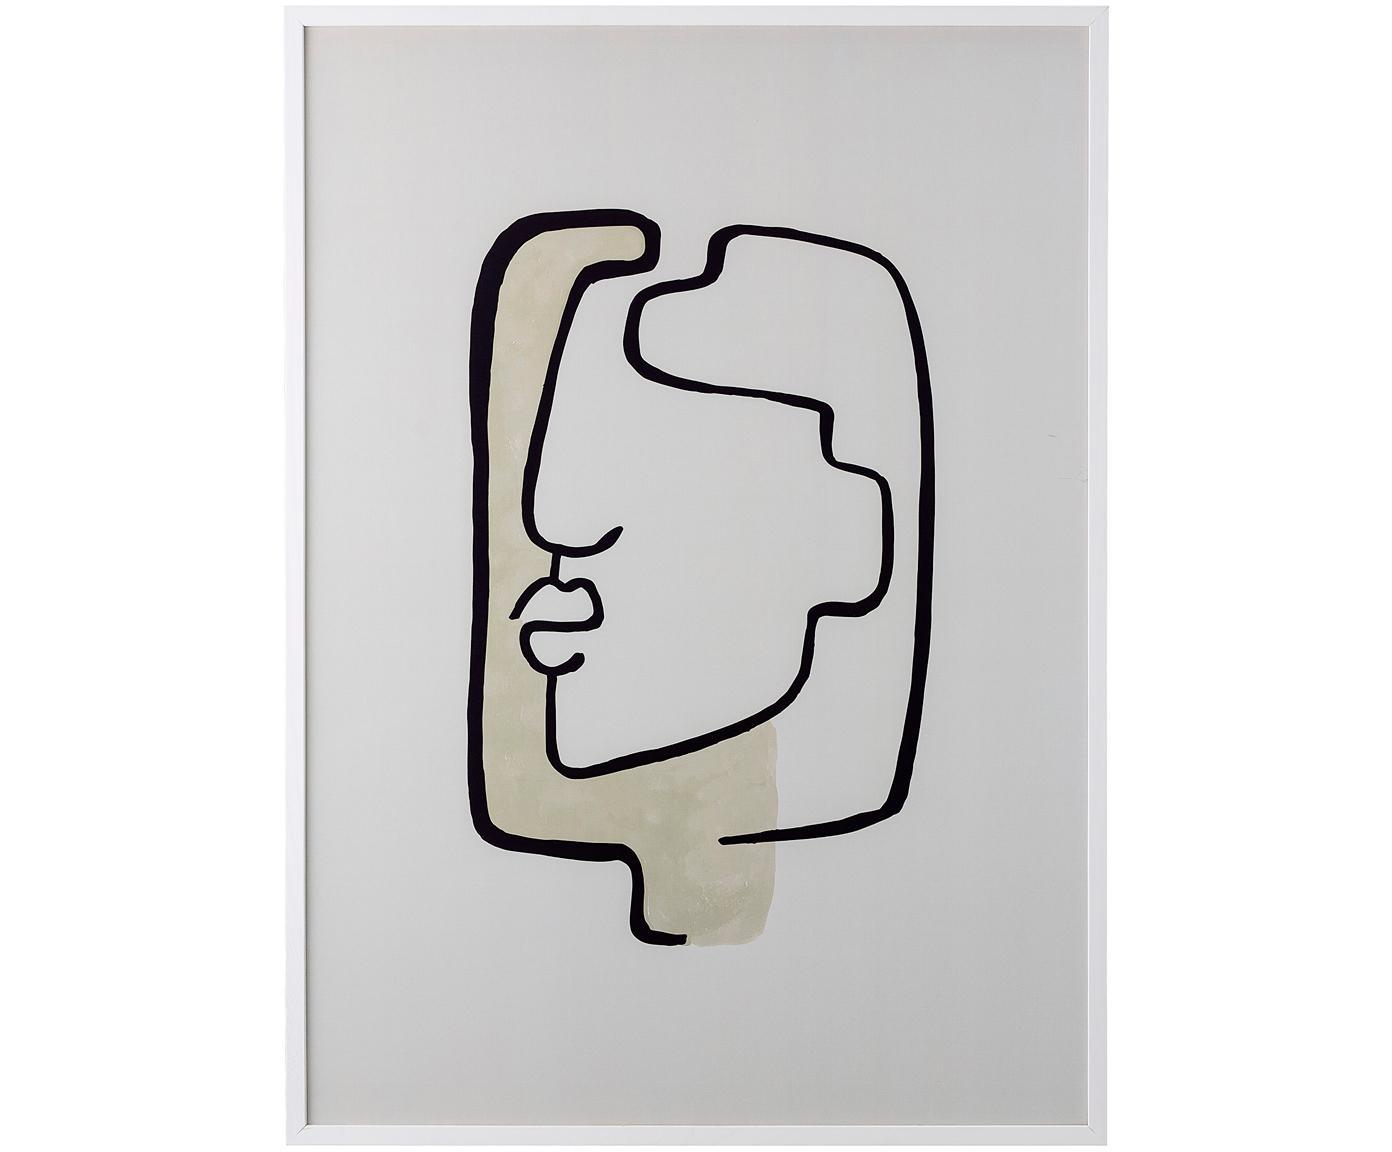 Impresión digital enmarcada Tessa, Beige, blanco, negro, An 52 x Al 72 cm